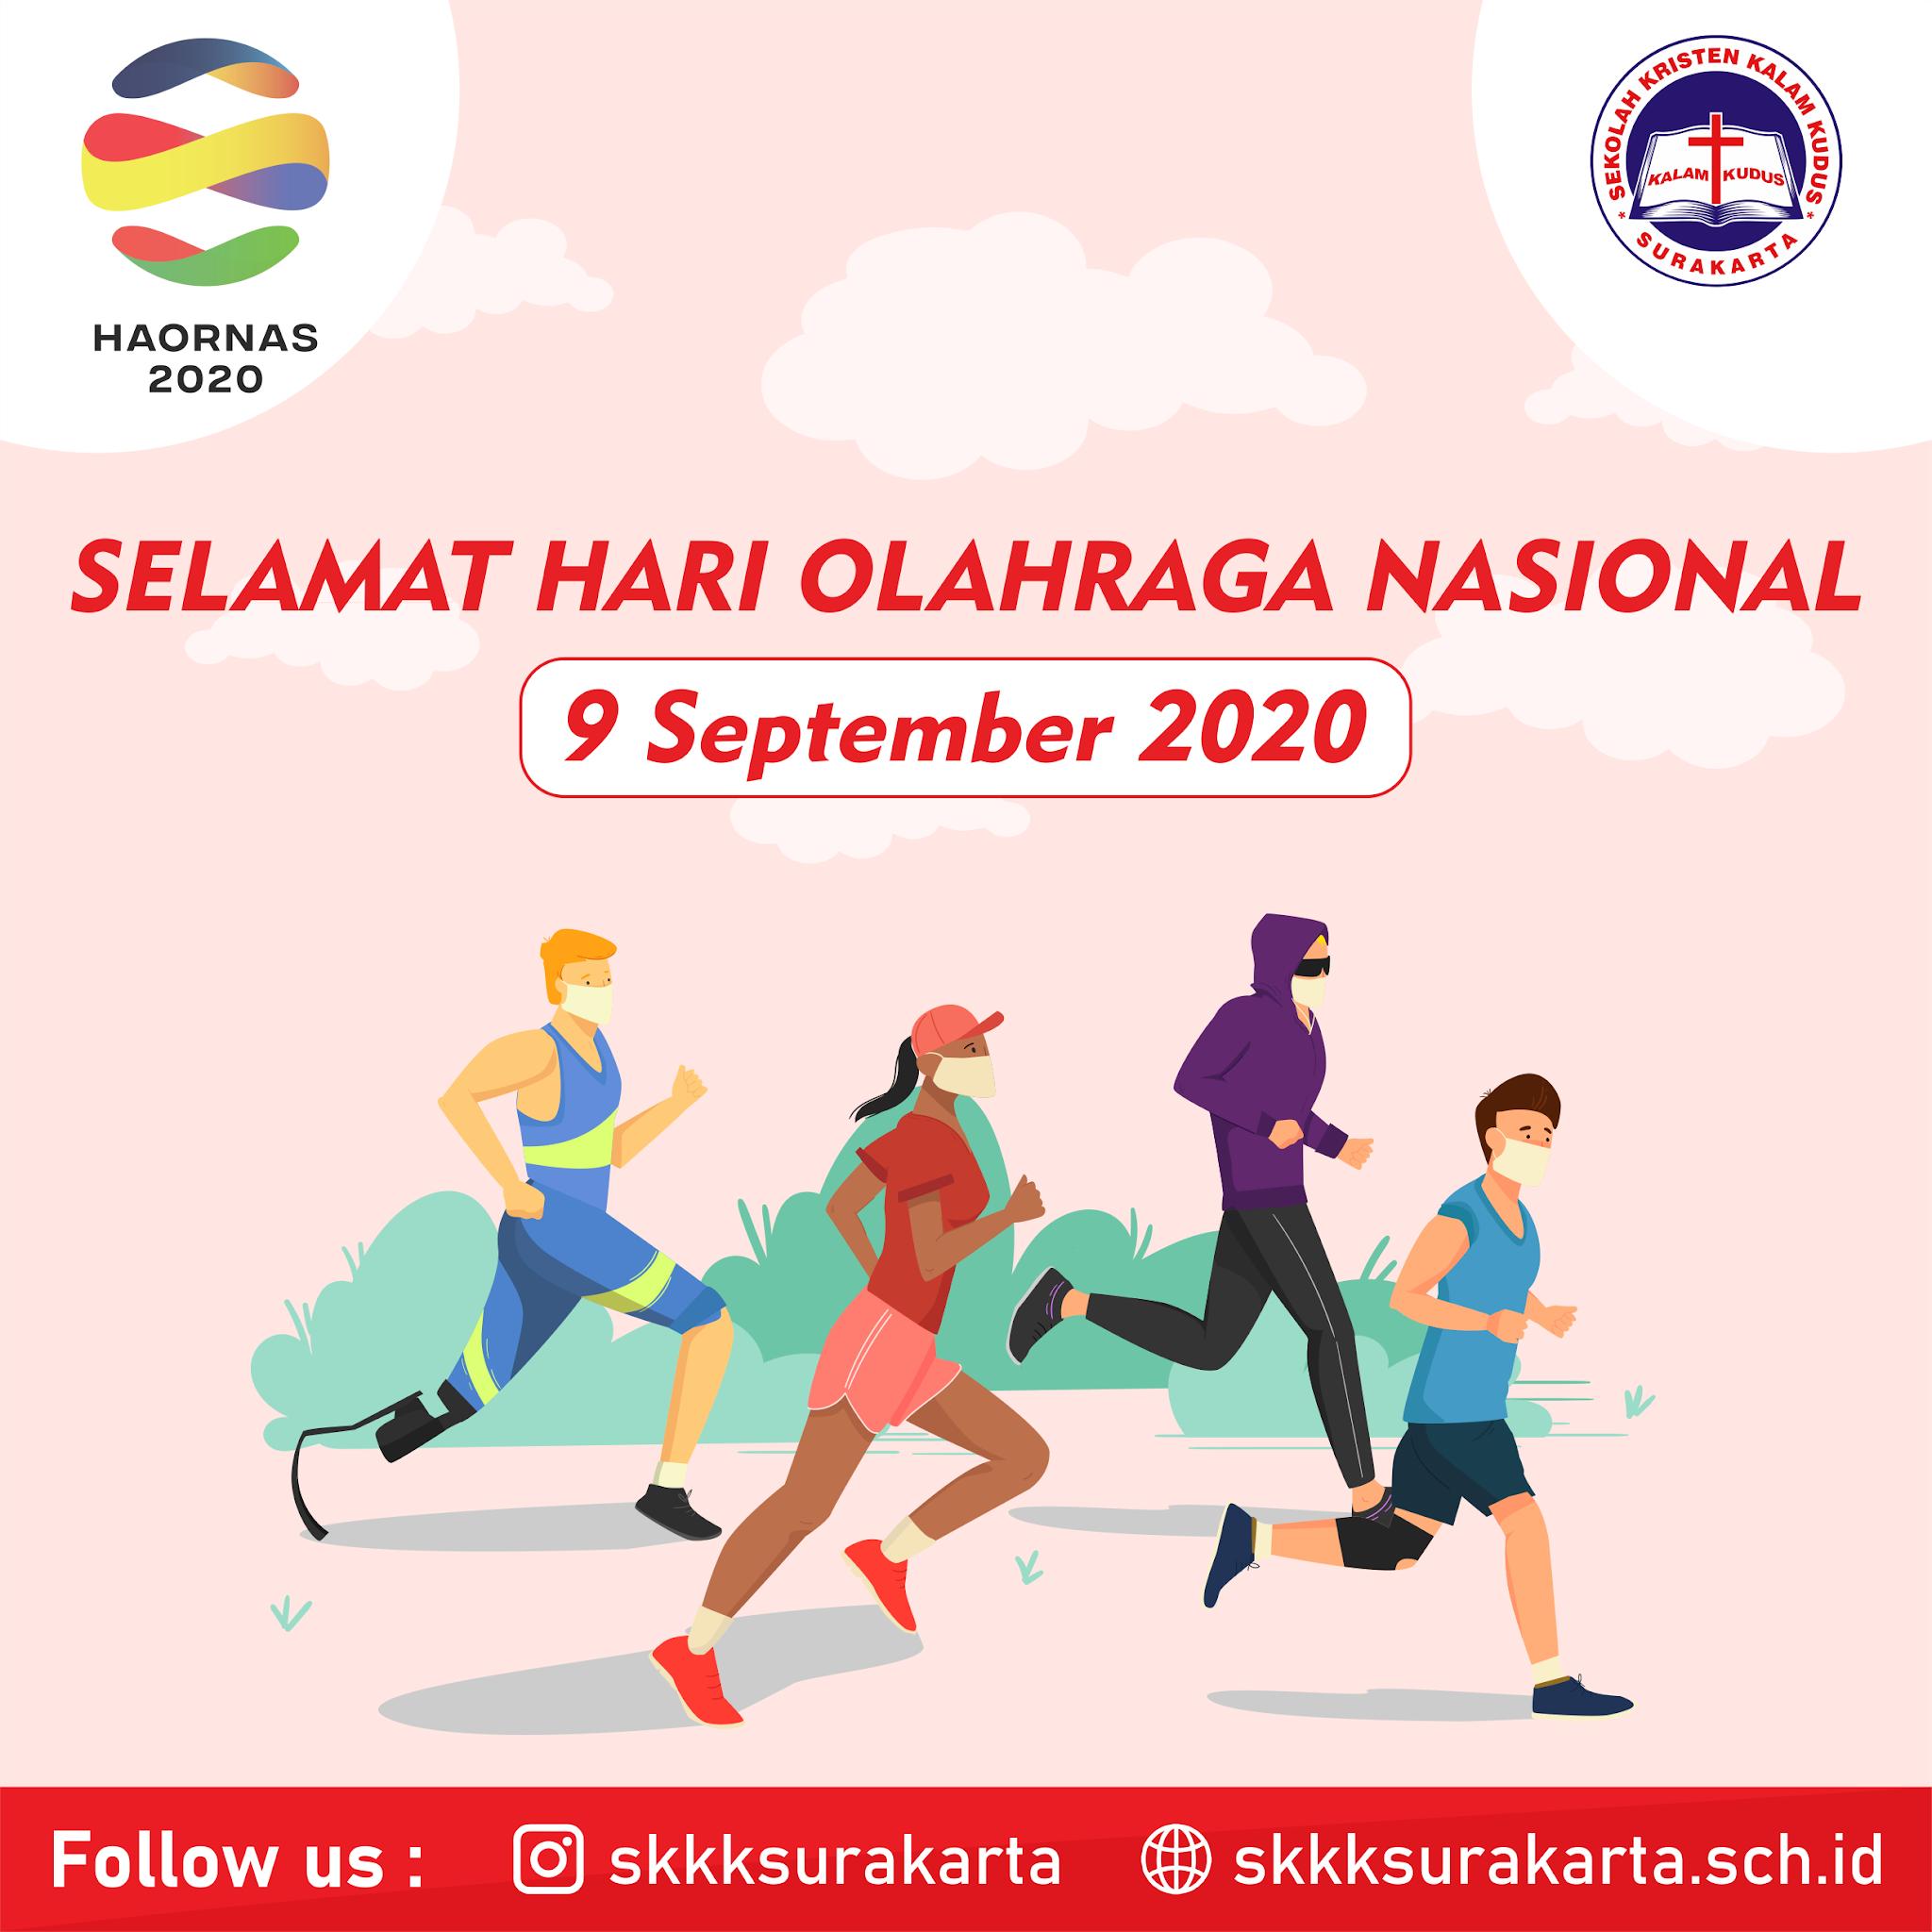 Hari Olahraga Nasional 2020